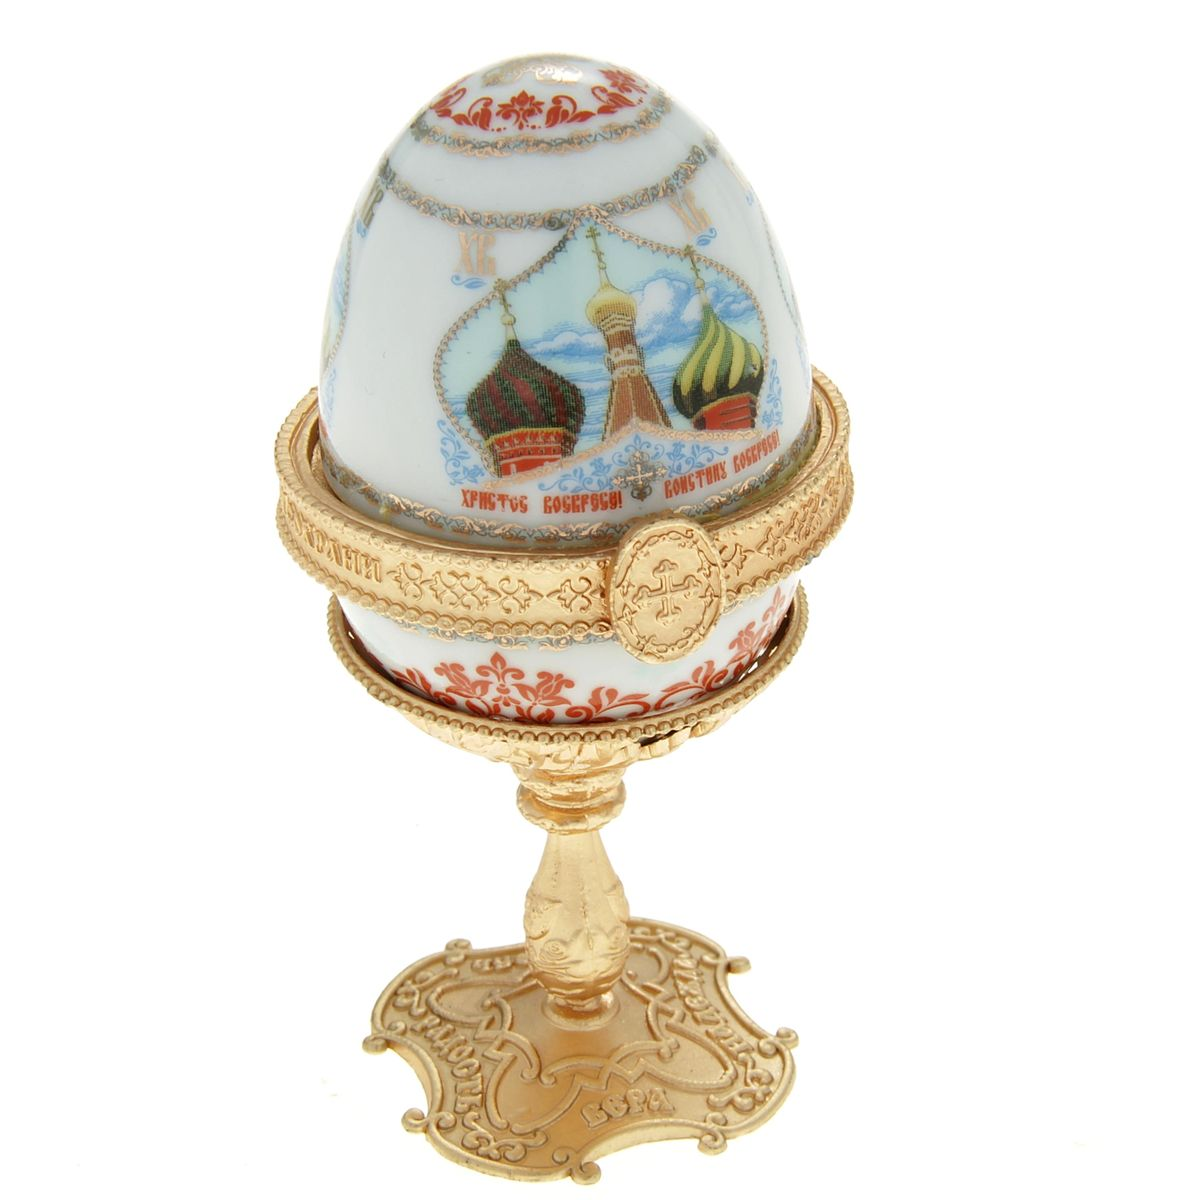 Яйцо-шкатулка Sima-land Купола, на подставке, высота 10 см яйцо шкатулка sima land цветочный без ножек 5 х 5 х 6 5 см